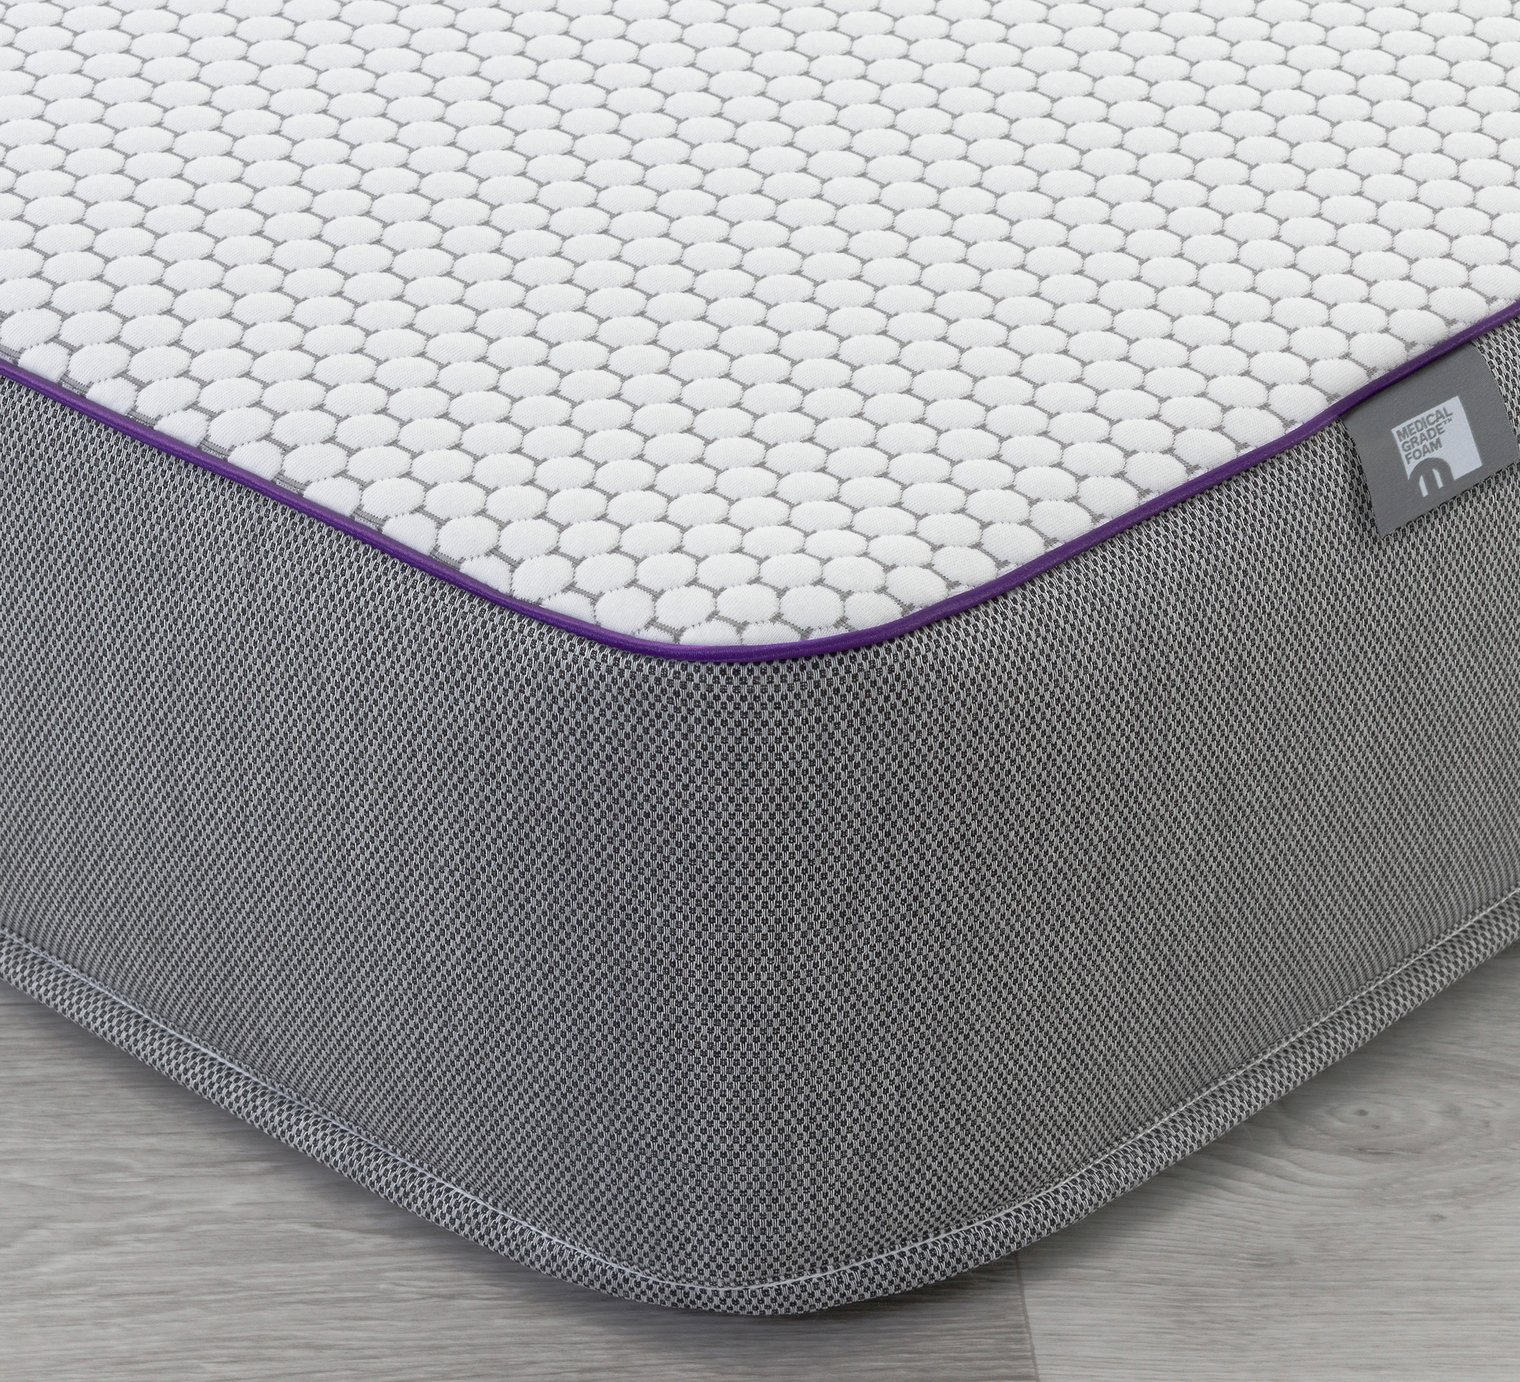 Mammoth wake essential single mattress